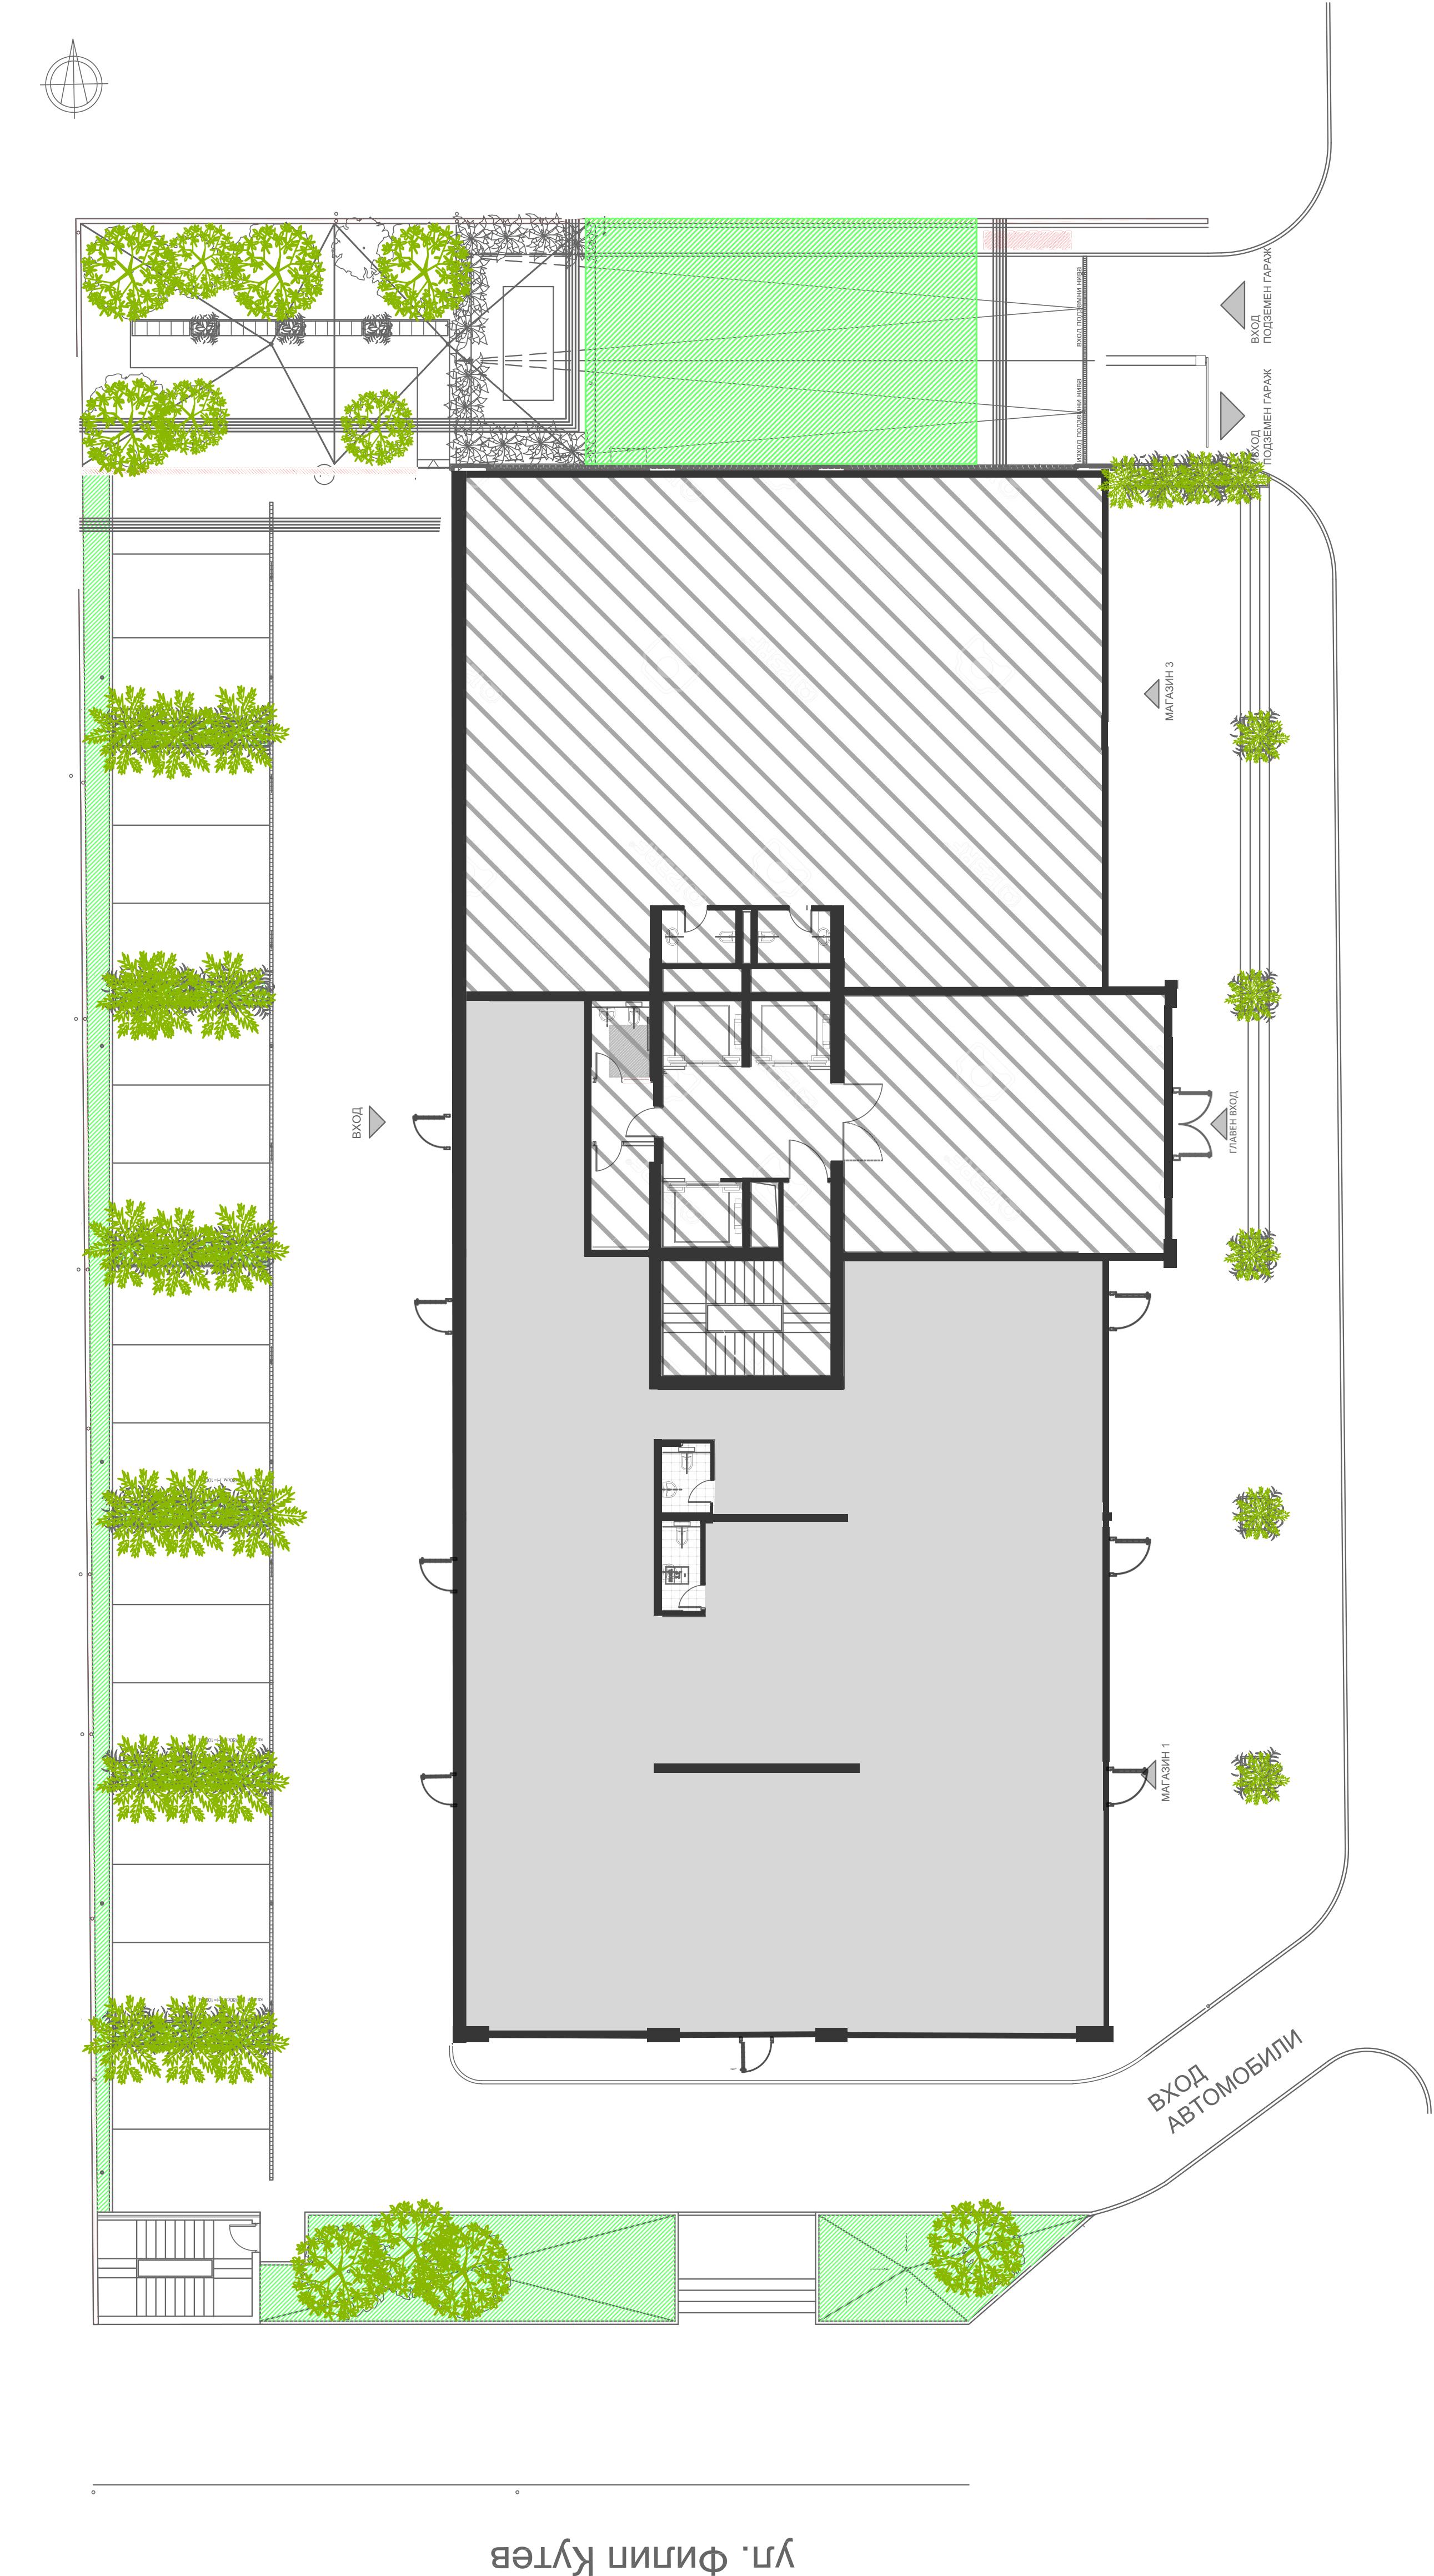 NAEMI_MAGAZINI_CHERTEJ_EN_BUILDING_620